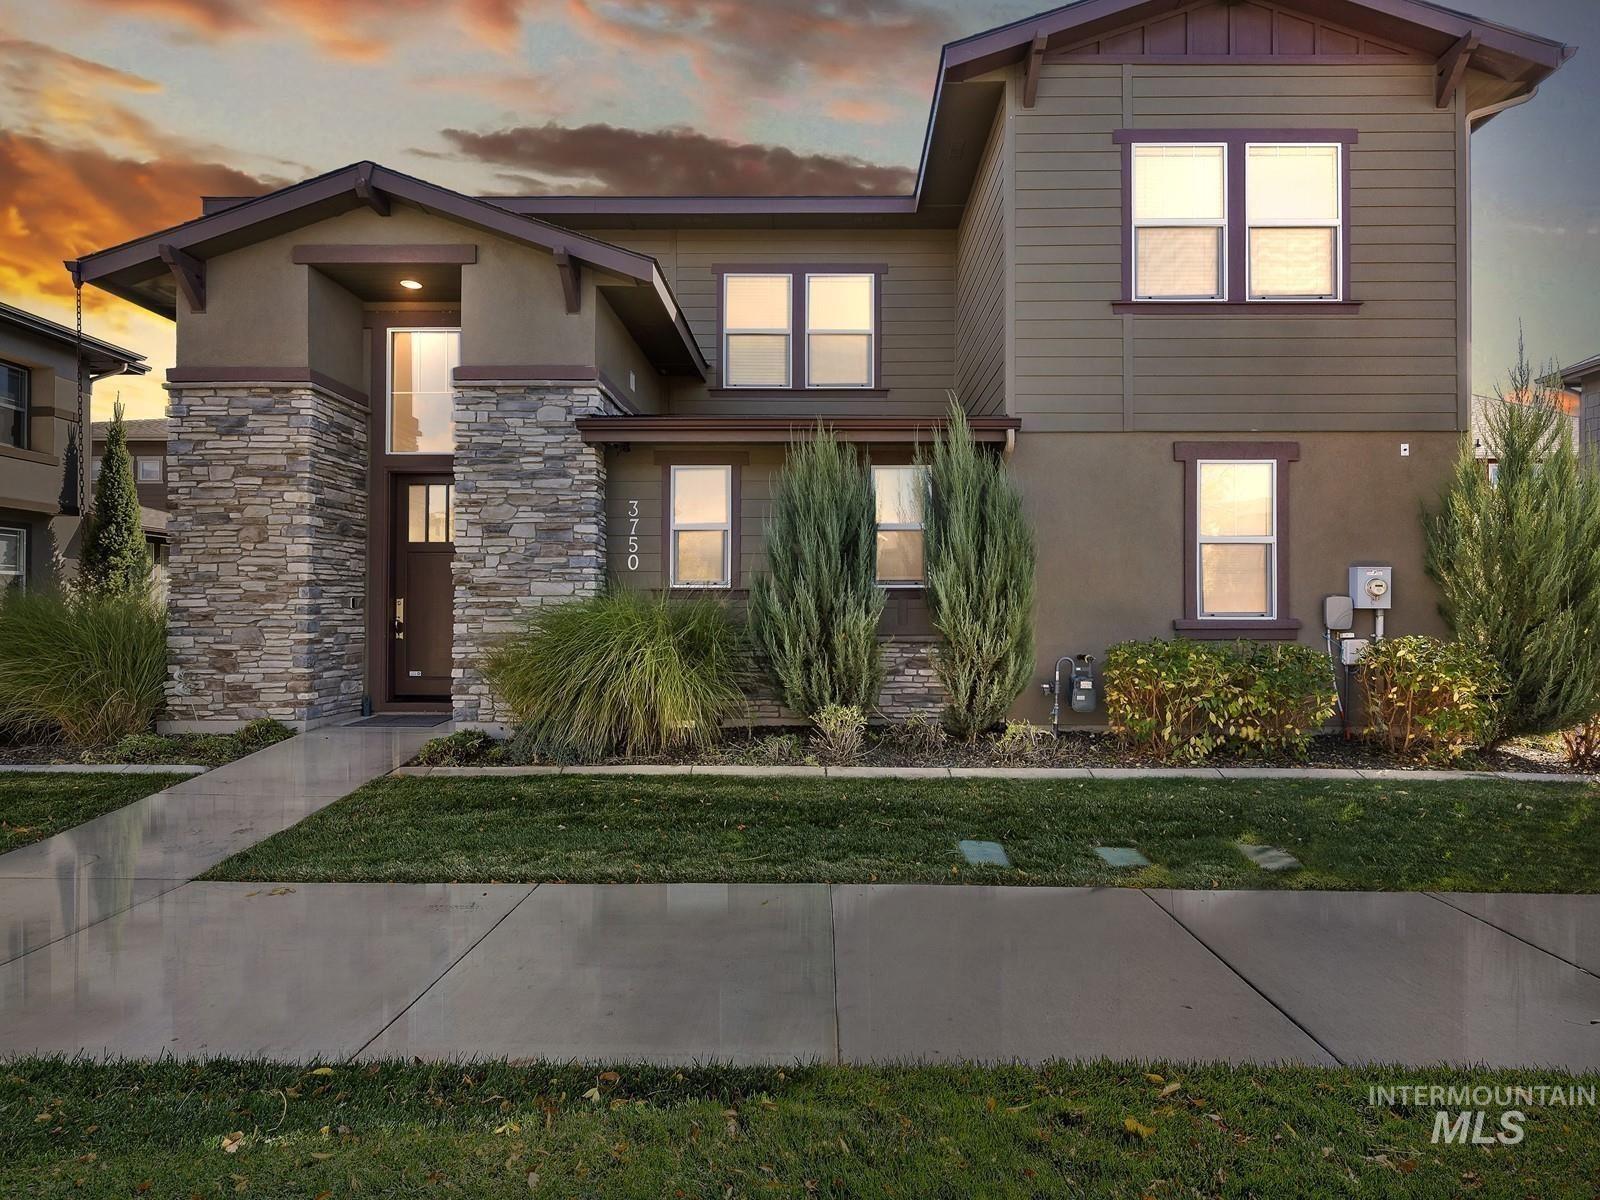 3750 S Caddis Place, Boise, ID 83716 - MLS#: 98822487